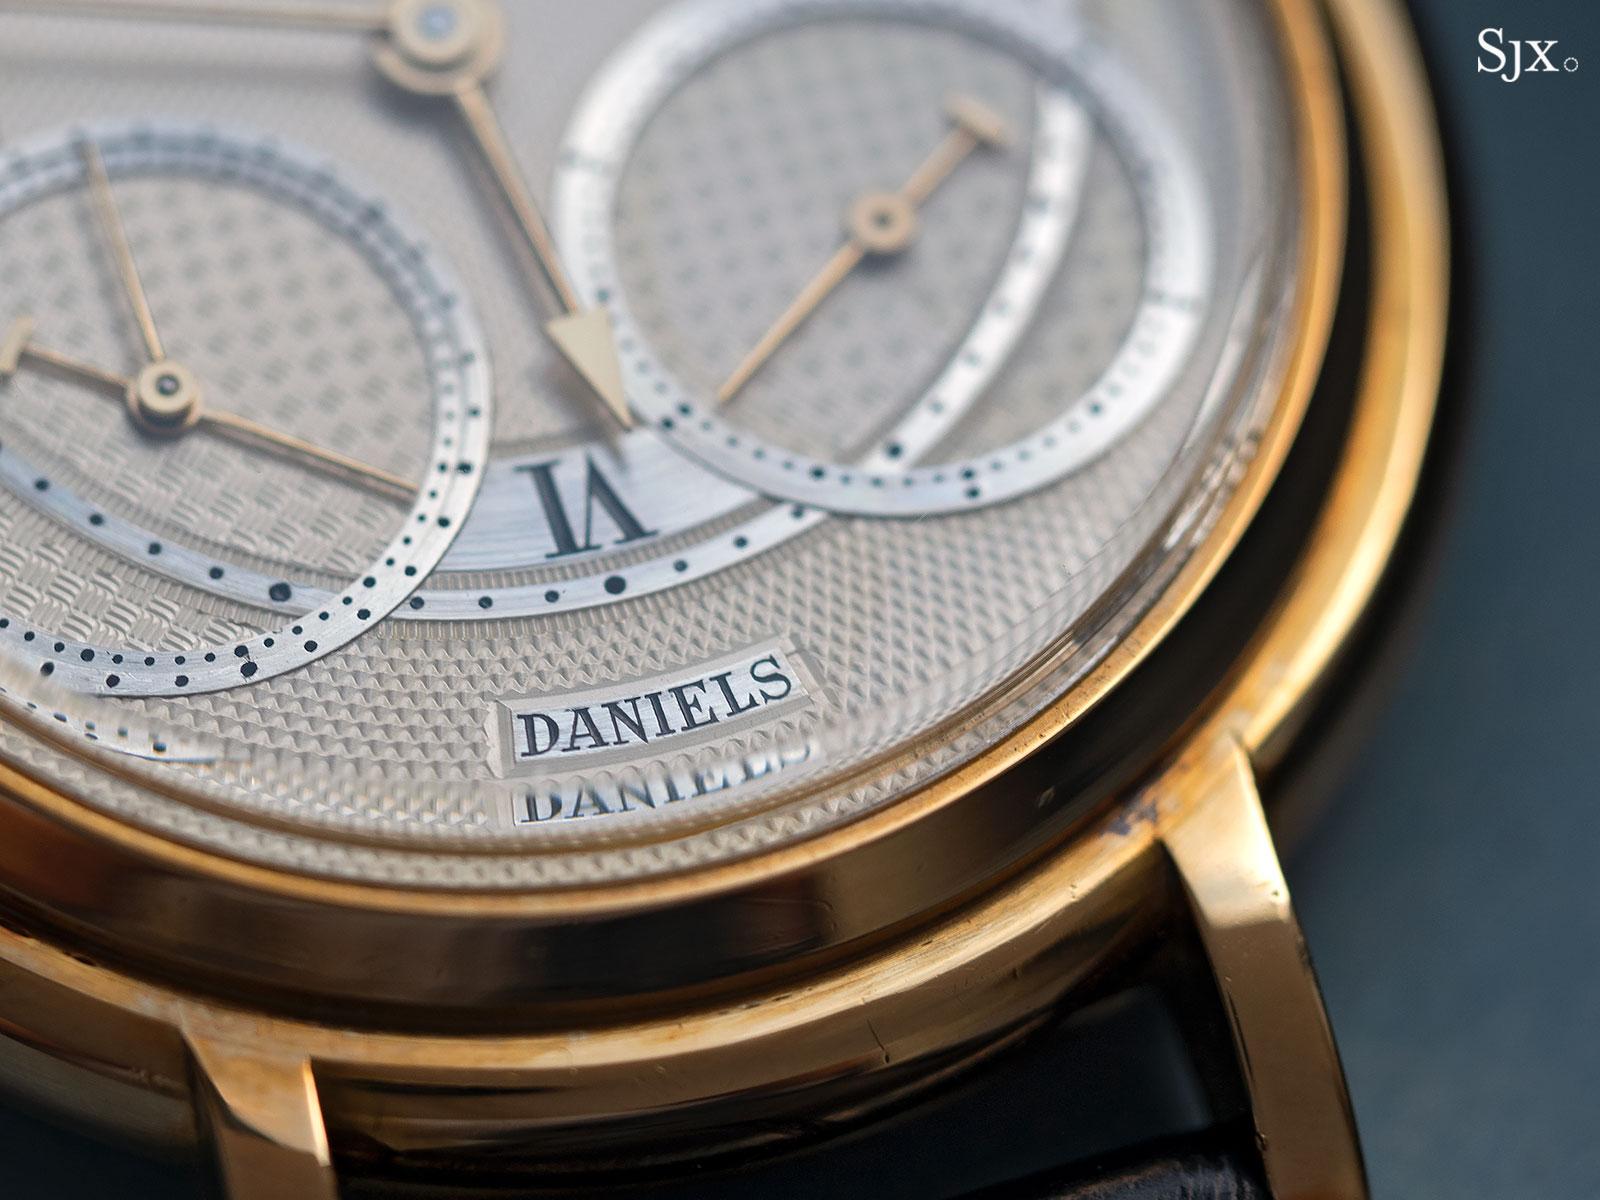 George Daniels Chronograph Wristwatch with tourbillon 2